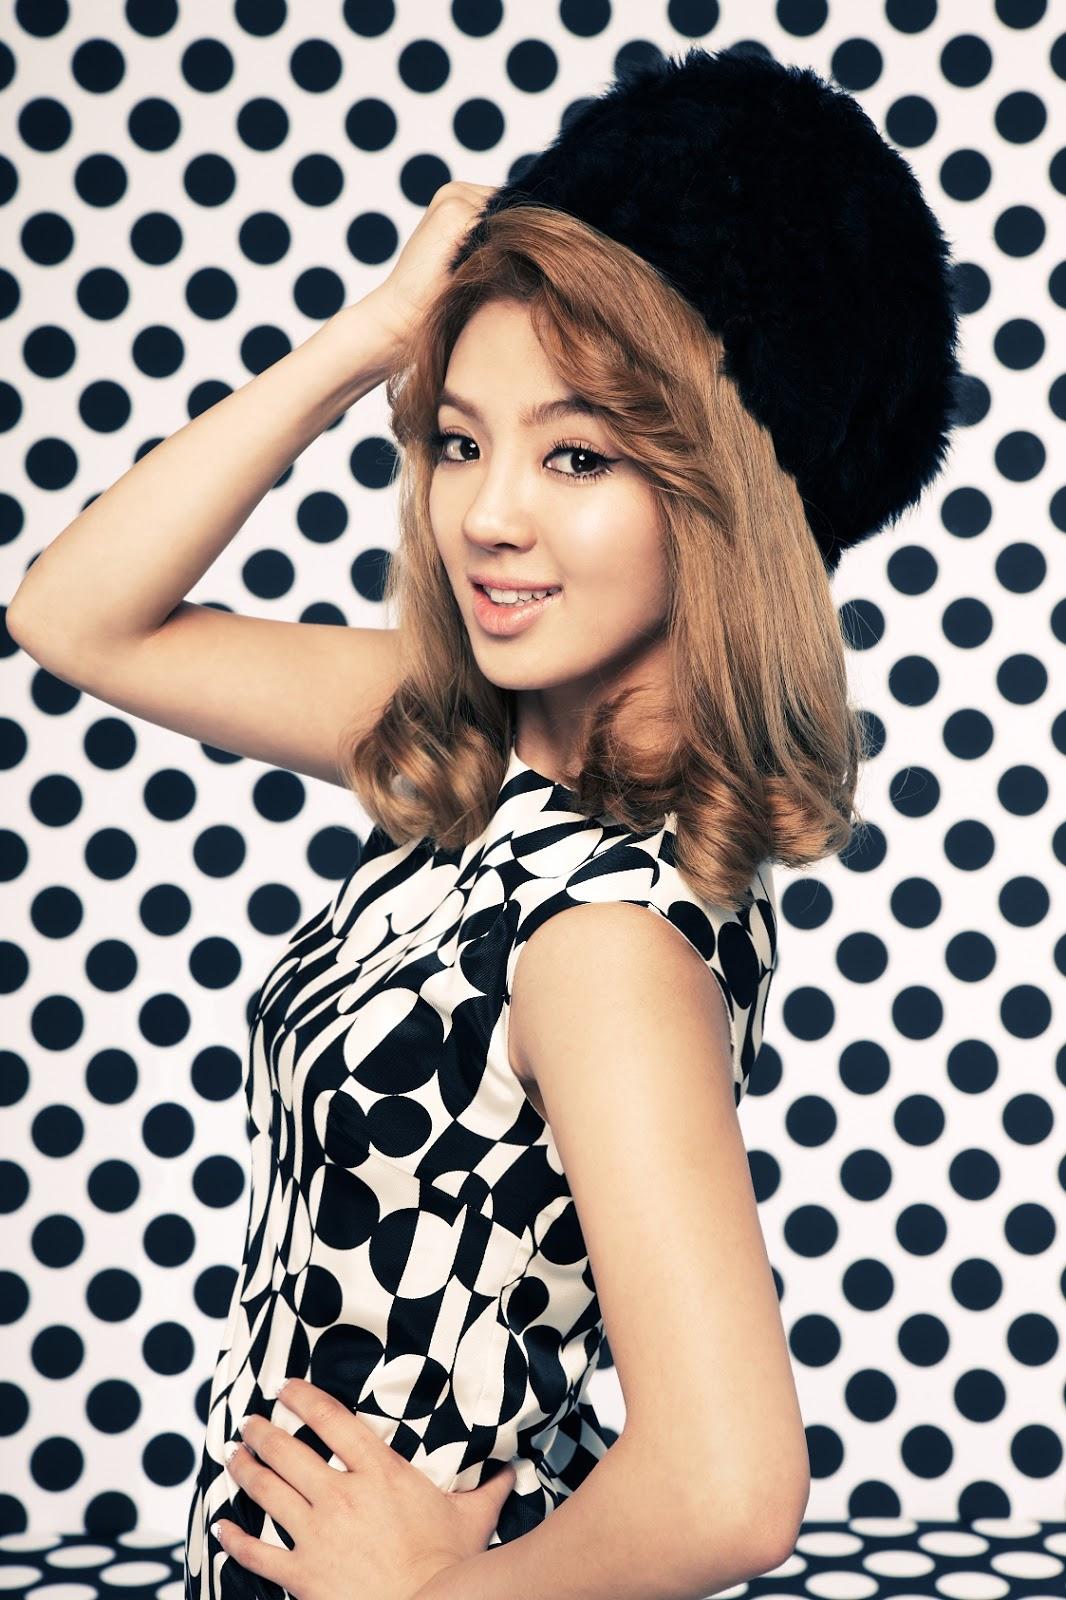 Hyoyeon SNSD Black White Style Wallpaper SNSD Artistic Gallery 1066x1600